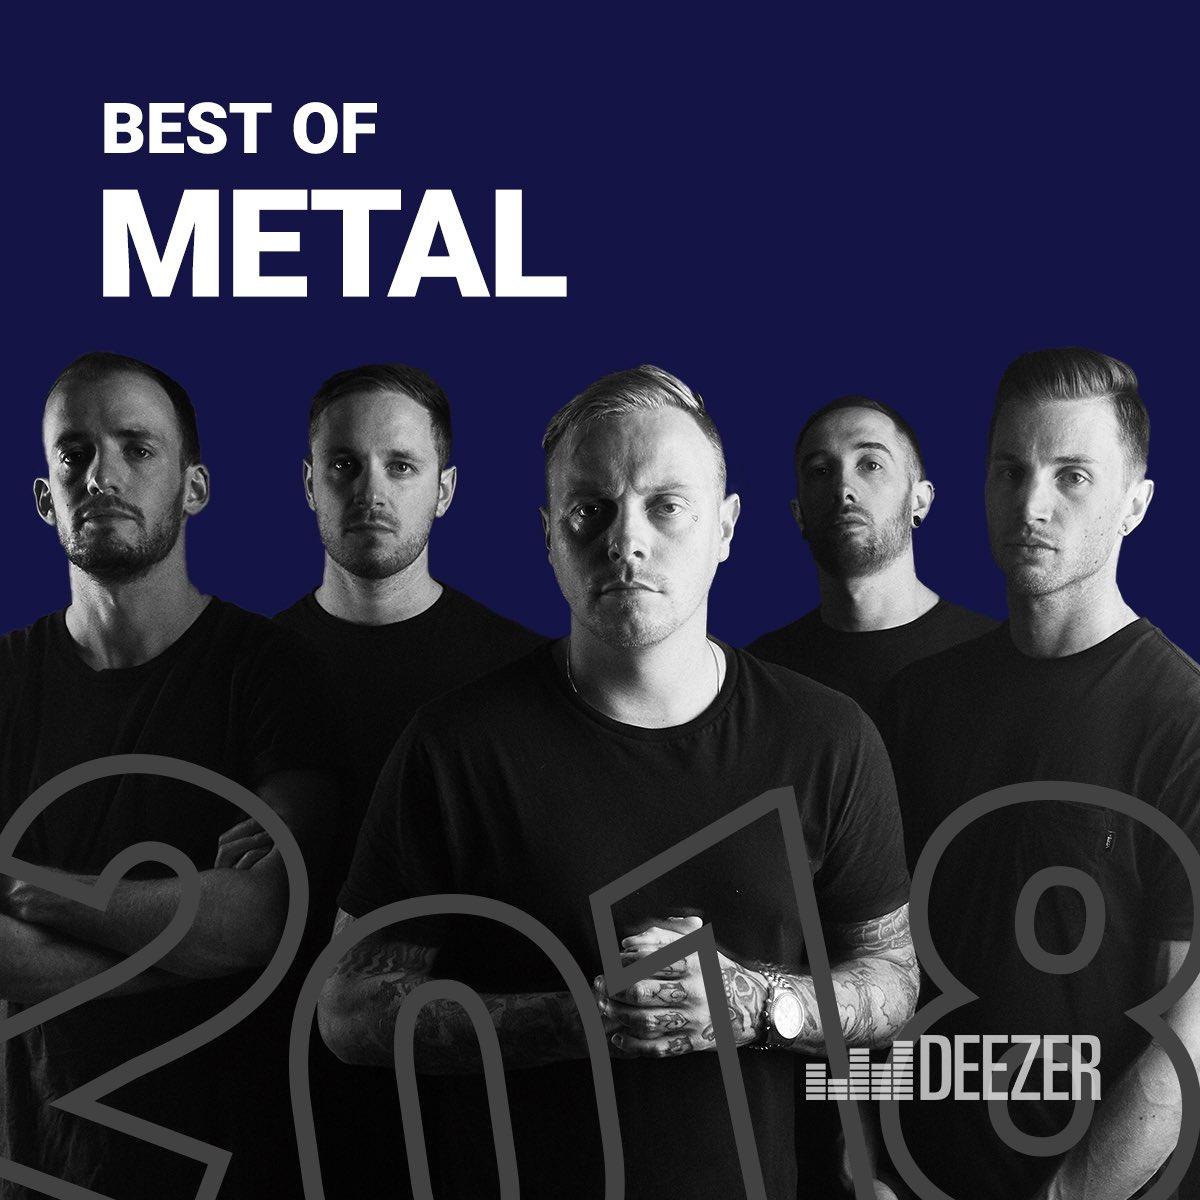 RT @Architectsuk: Best of Metal 2018 https://t.co/IrRUZh6VkS @Deezer https://t.co/MFVTSArFML